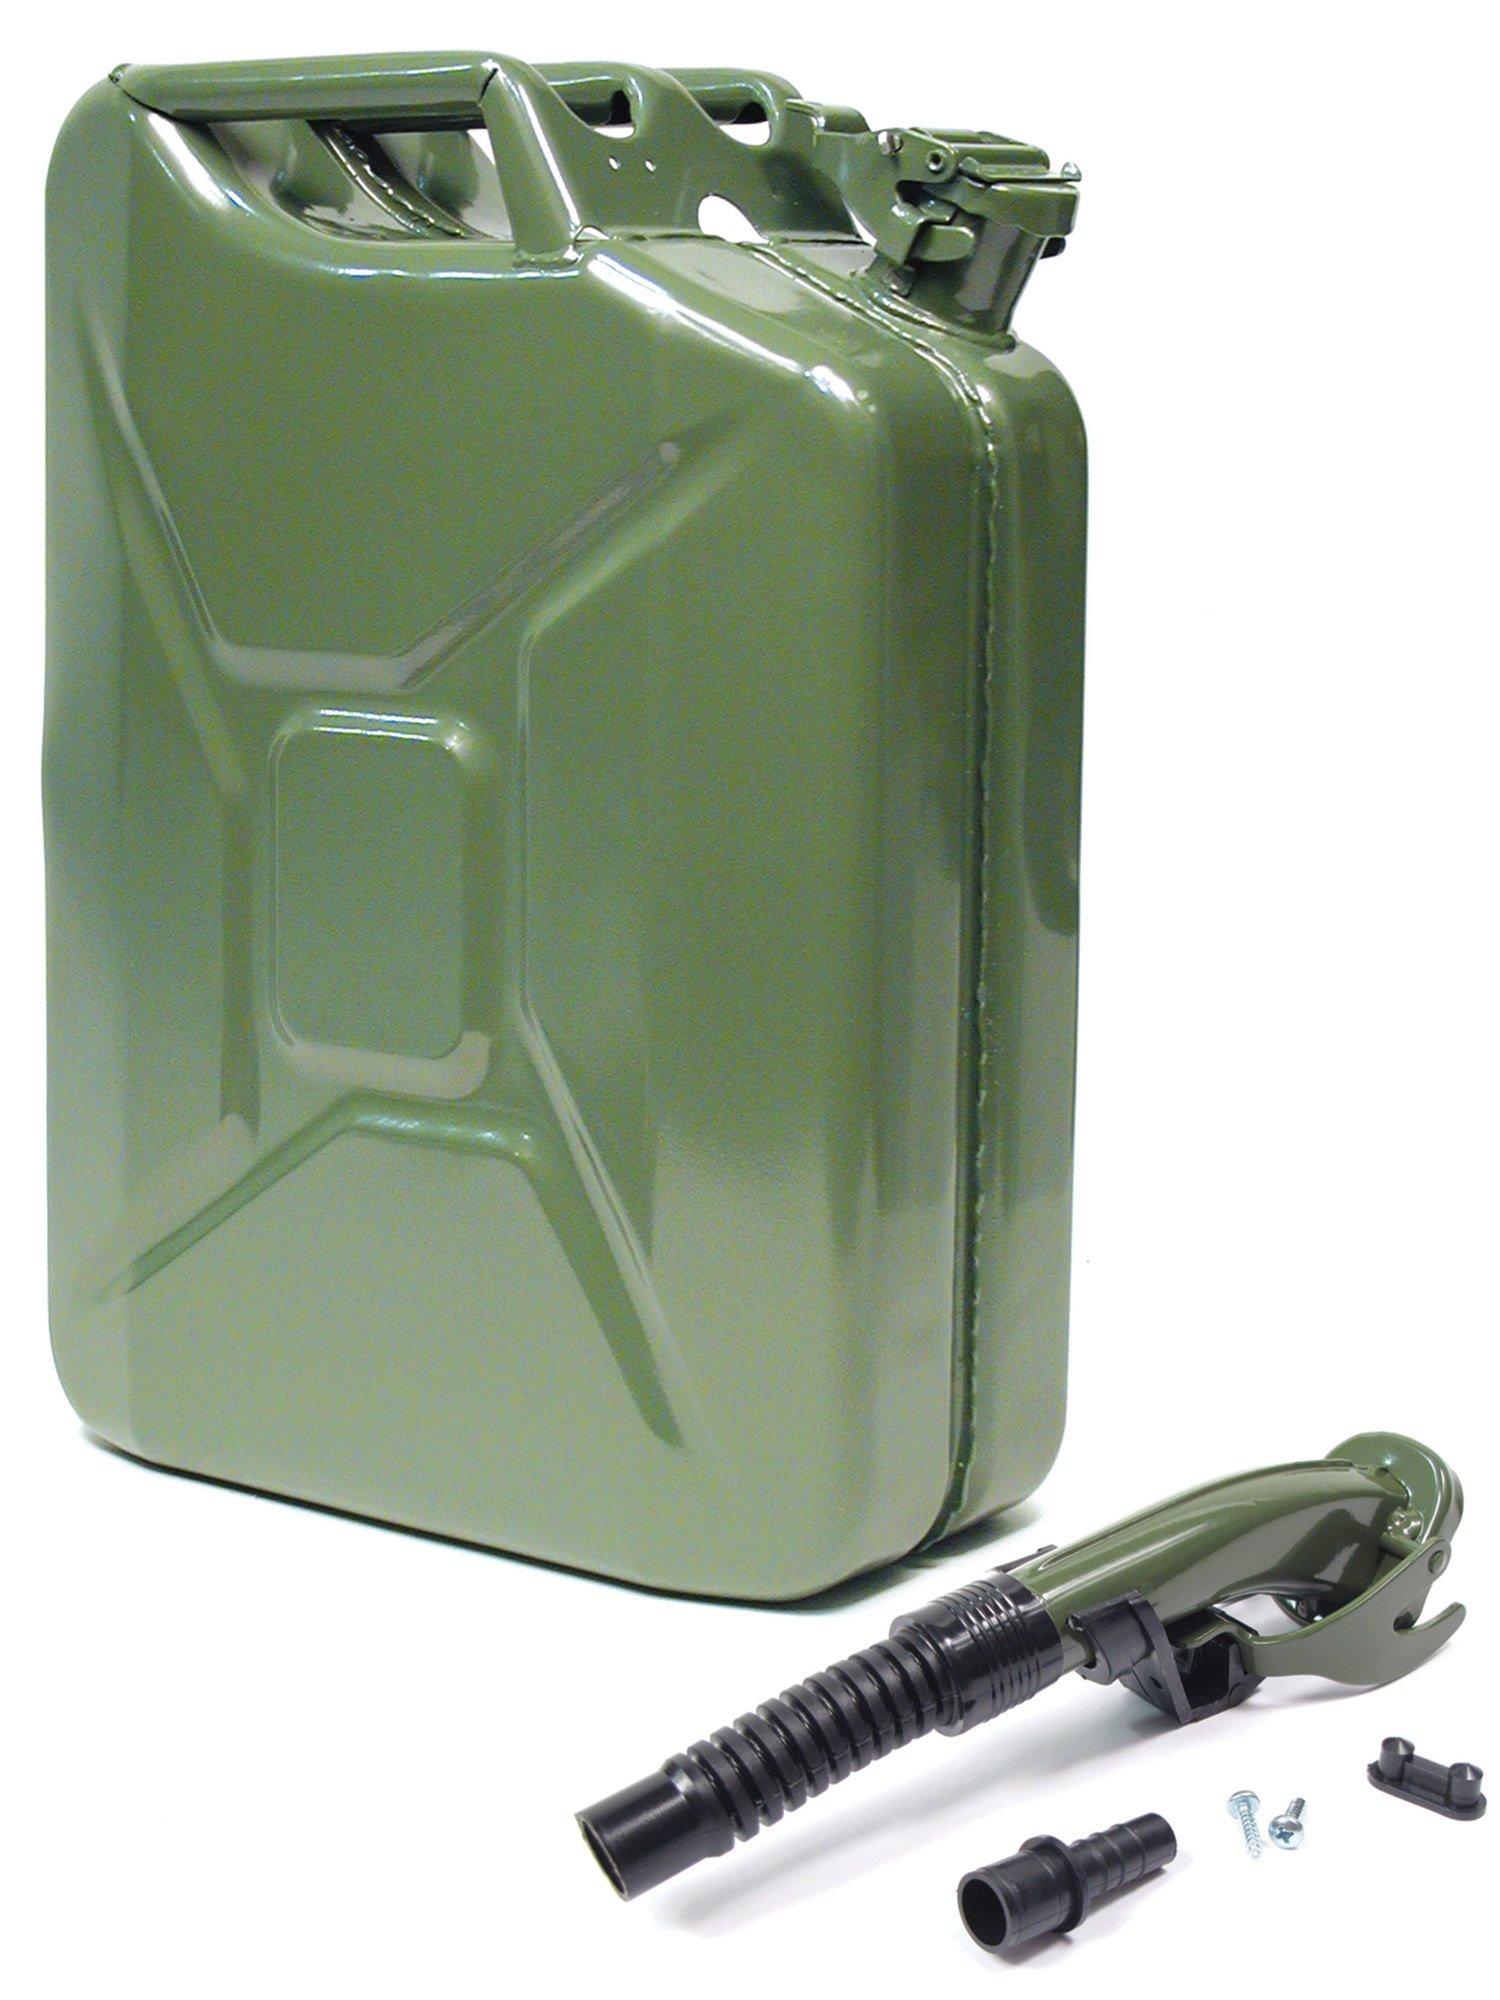 Atlantic British Ltd. Wavian 20 Liter (5 Gallon) NATO Jerry Can (GJC20) with Flexible Spout